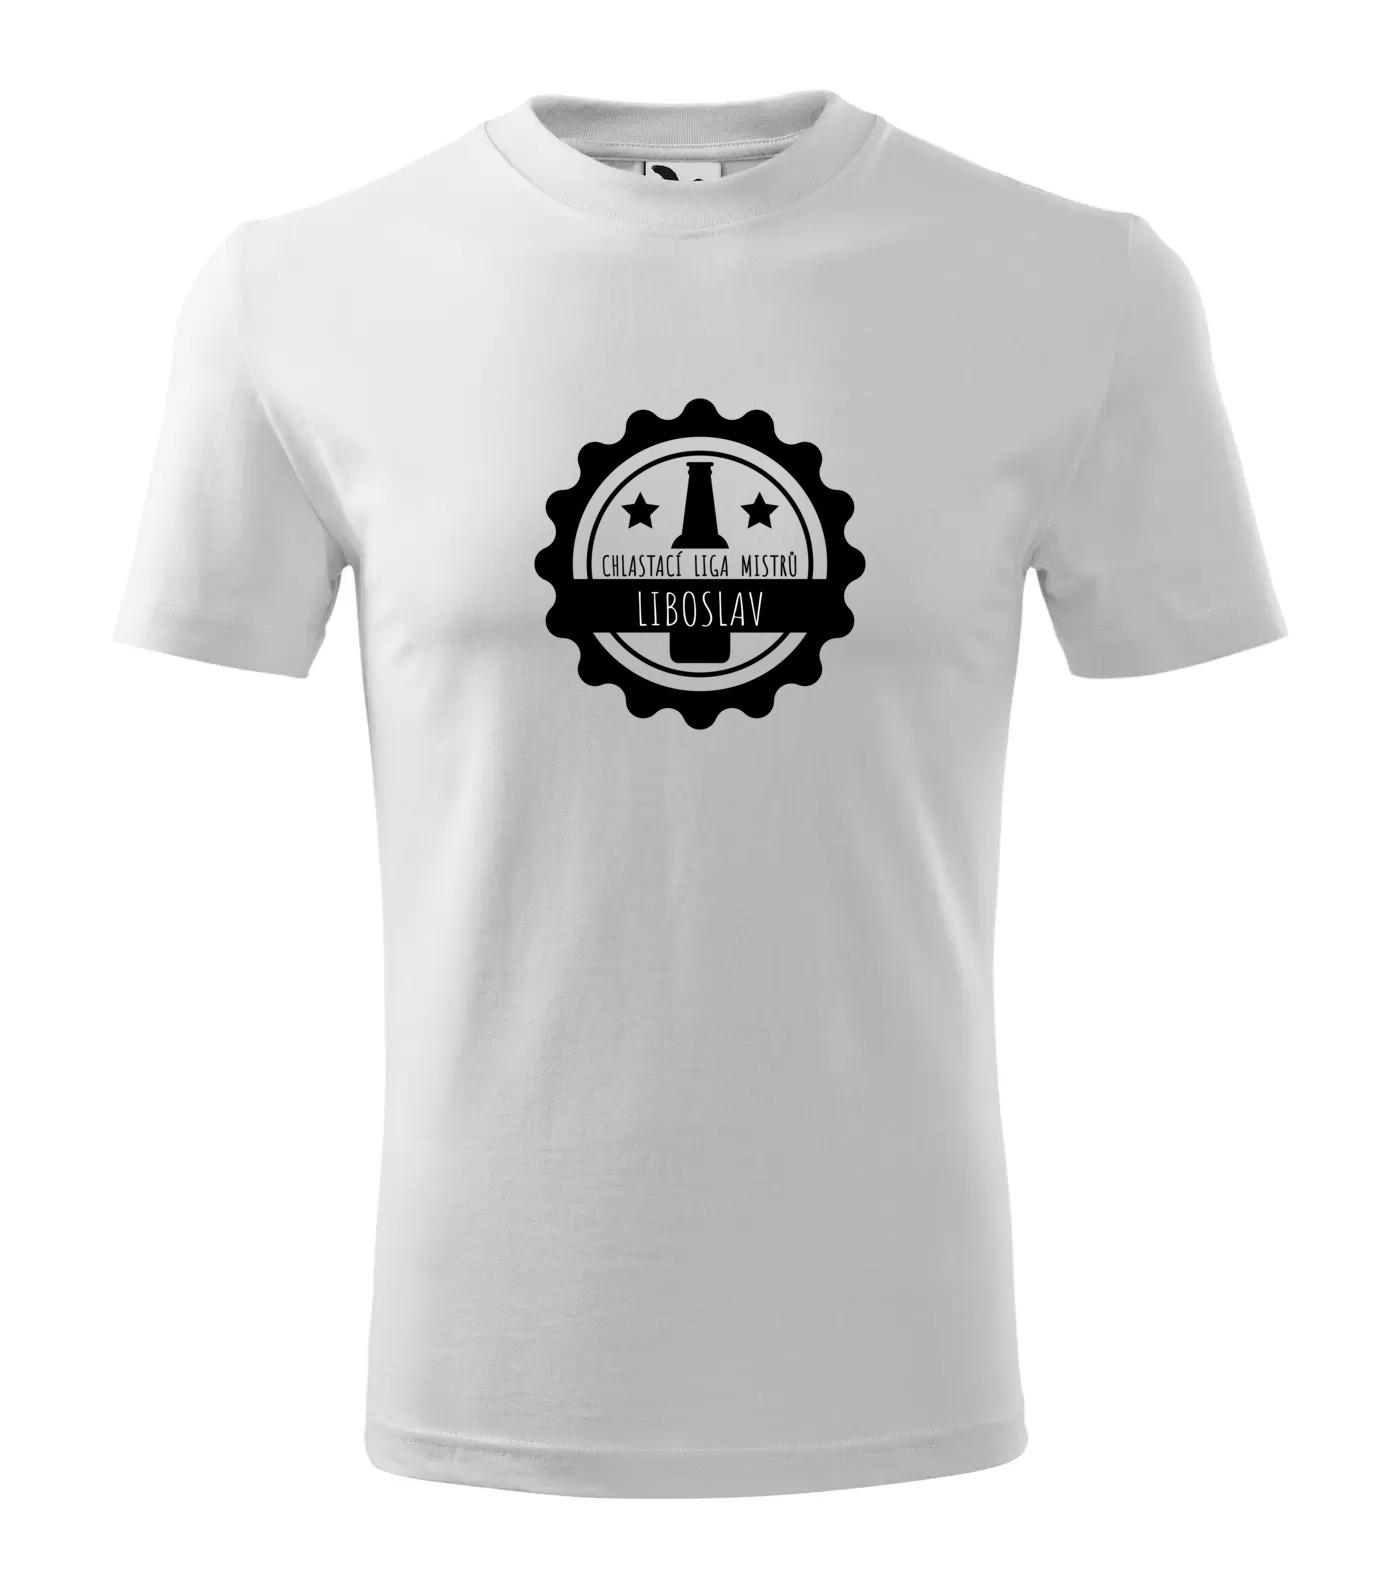 Tričko Chlastací liga mužů Liboslav